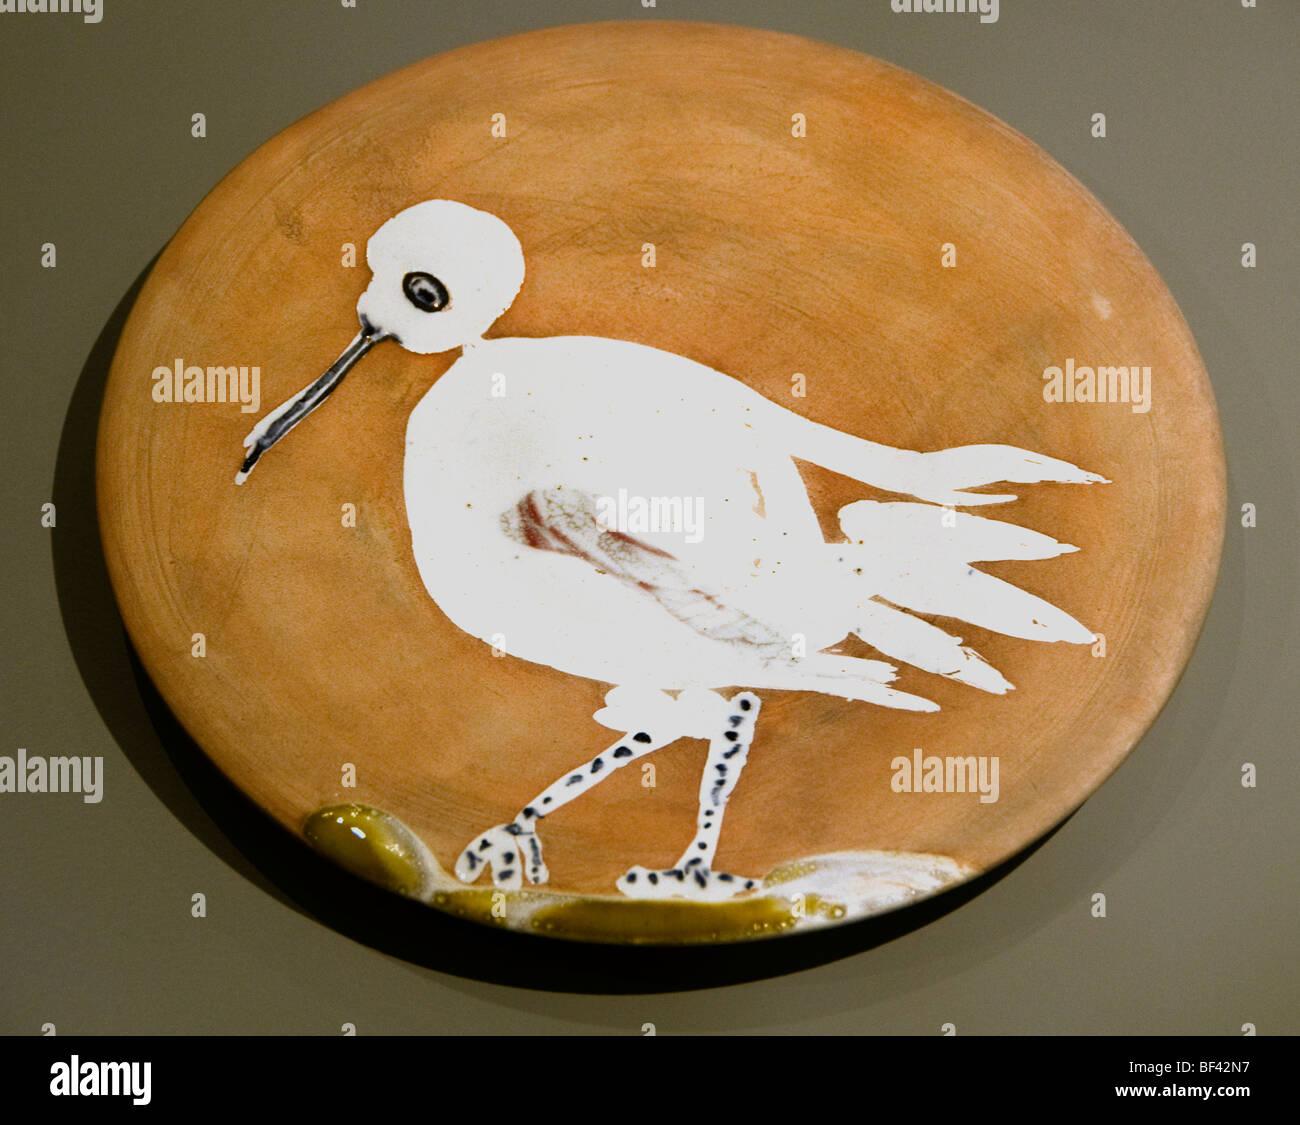 White Bird Paesi Bassi piastrelle Piastrelle di gres Immagini Stock